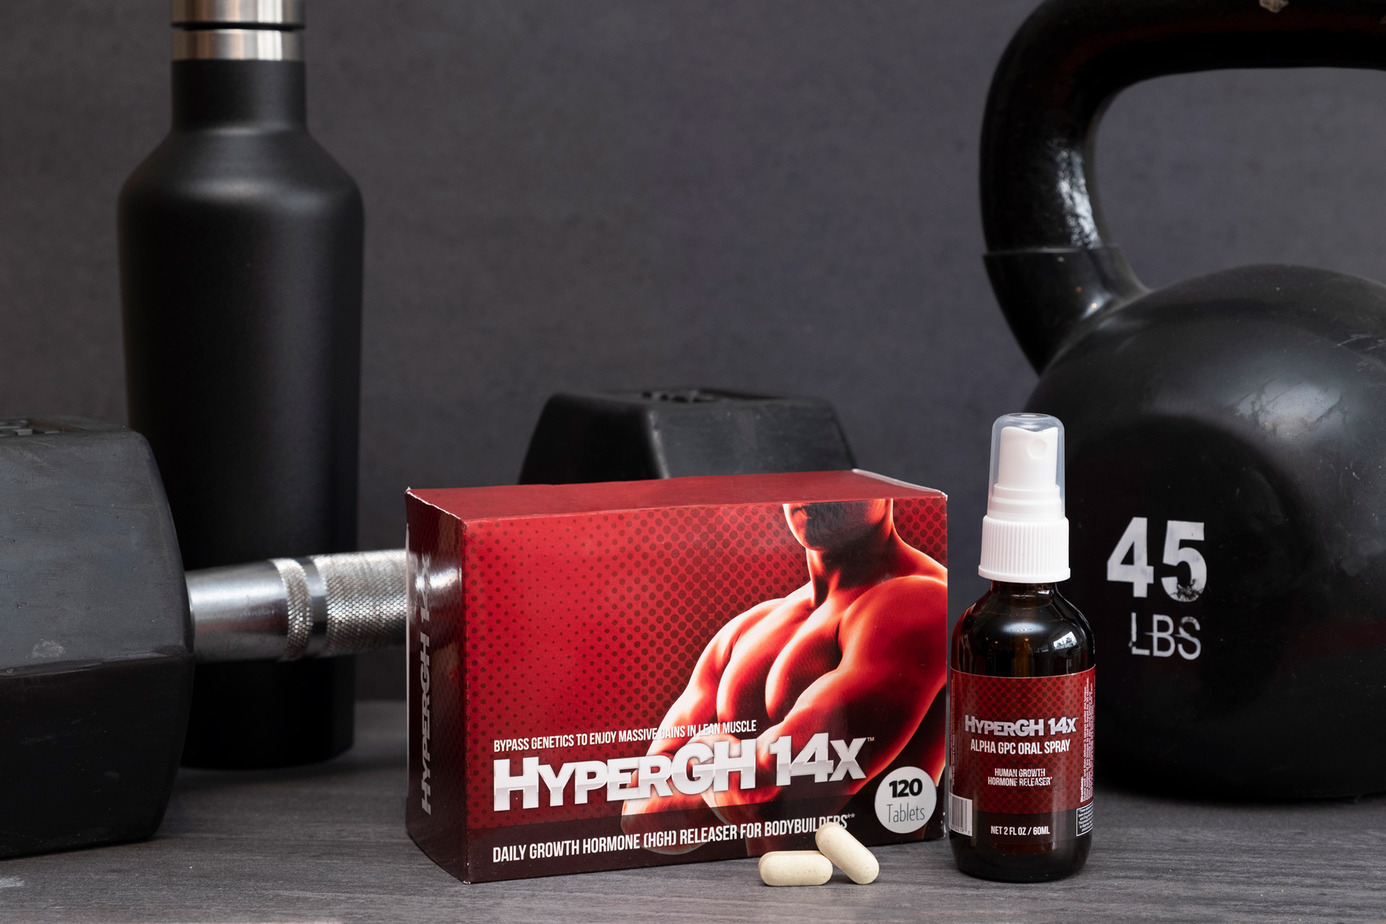 HyperGH14x Review